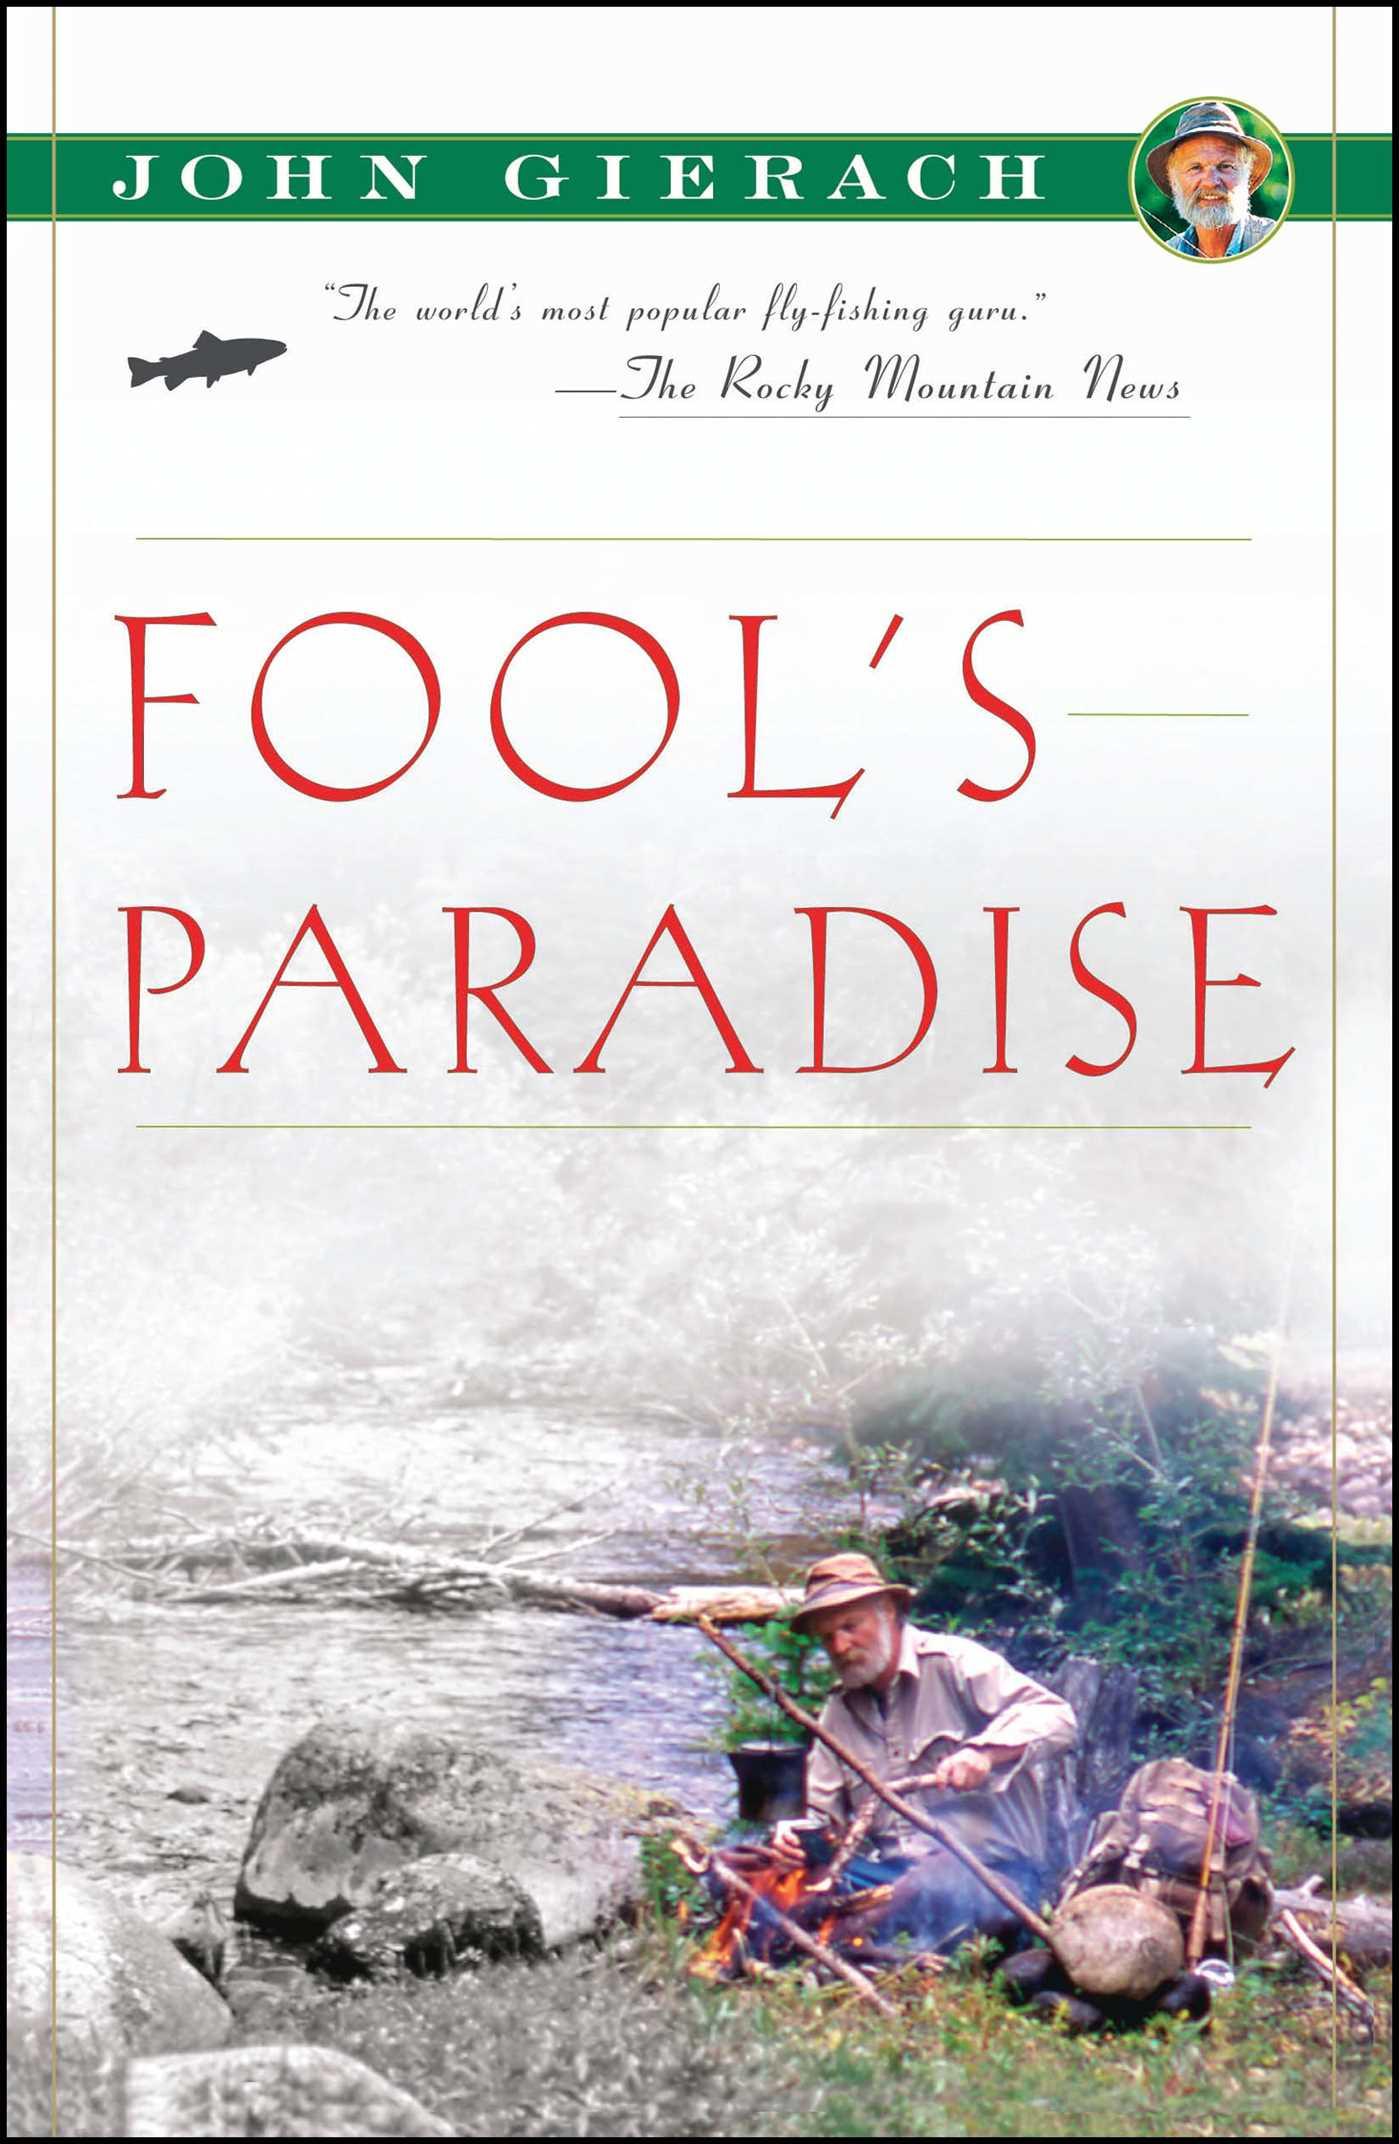 Fools paradise 9780743291743 hr